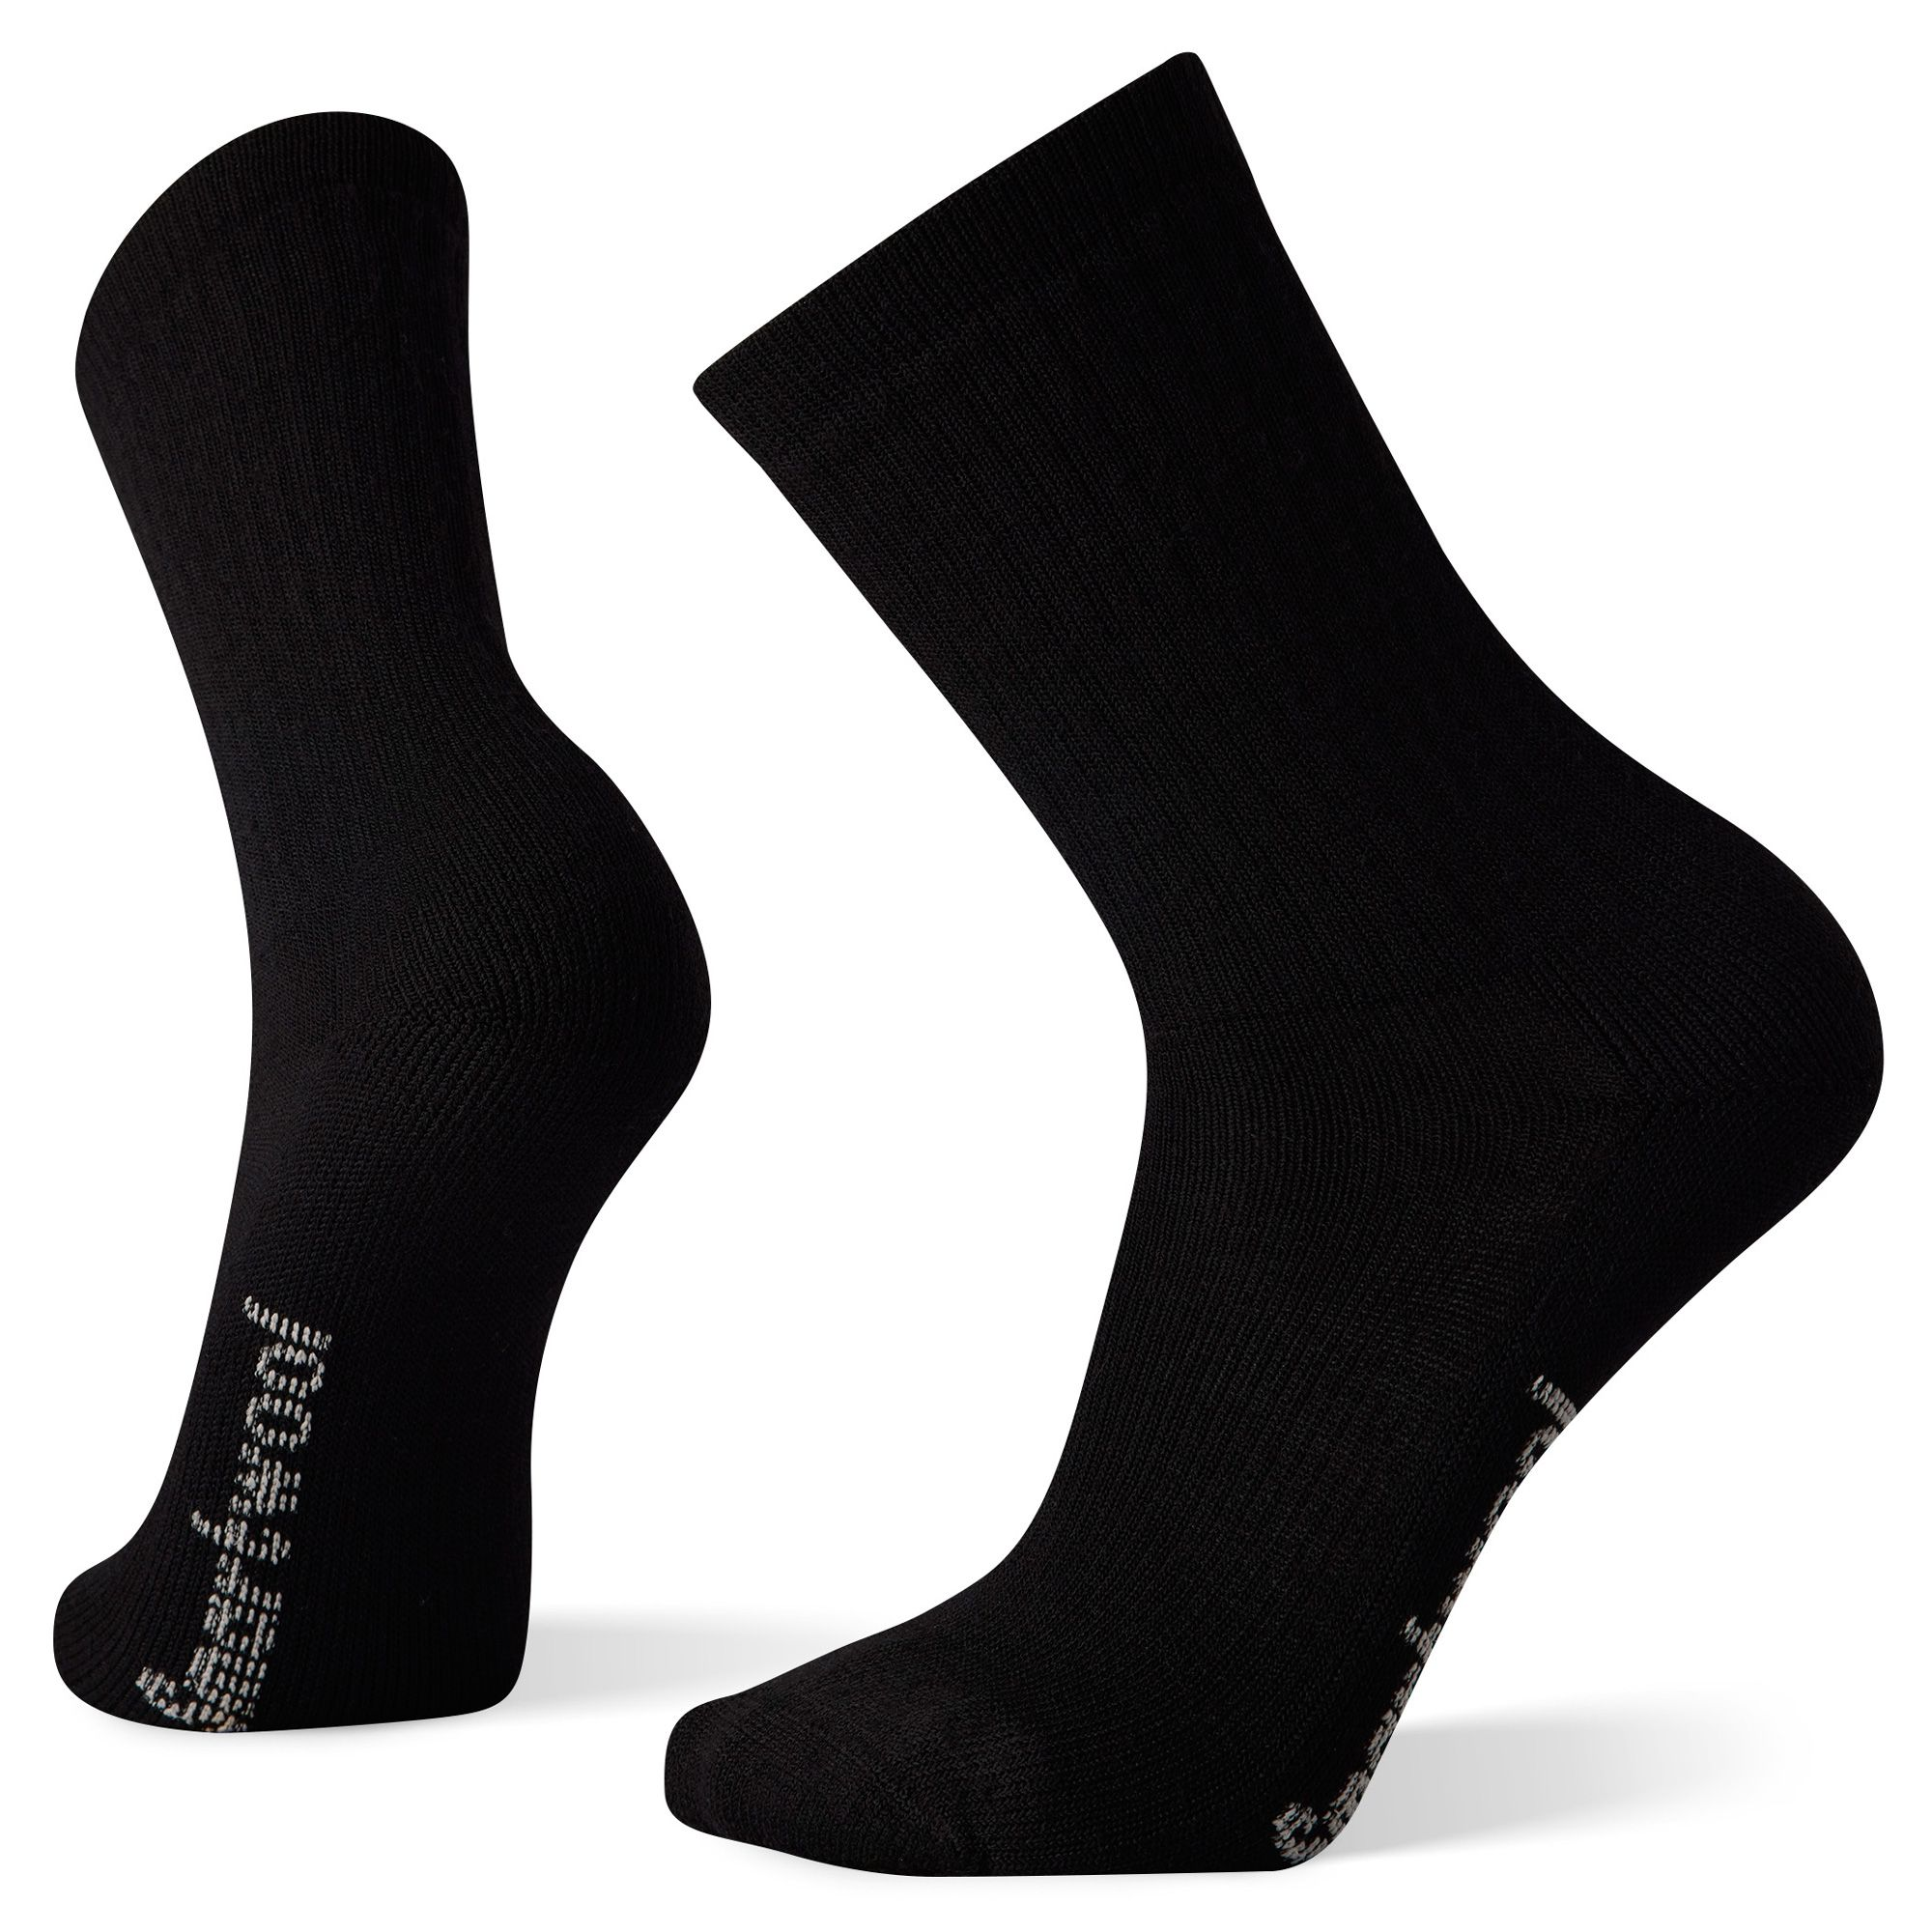 Hike Classic Edition Full Cushion Solid Crew Socks